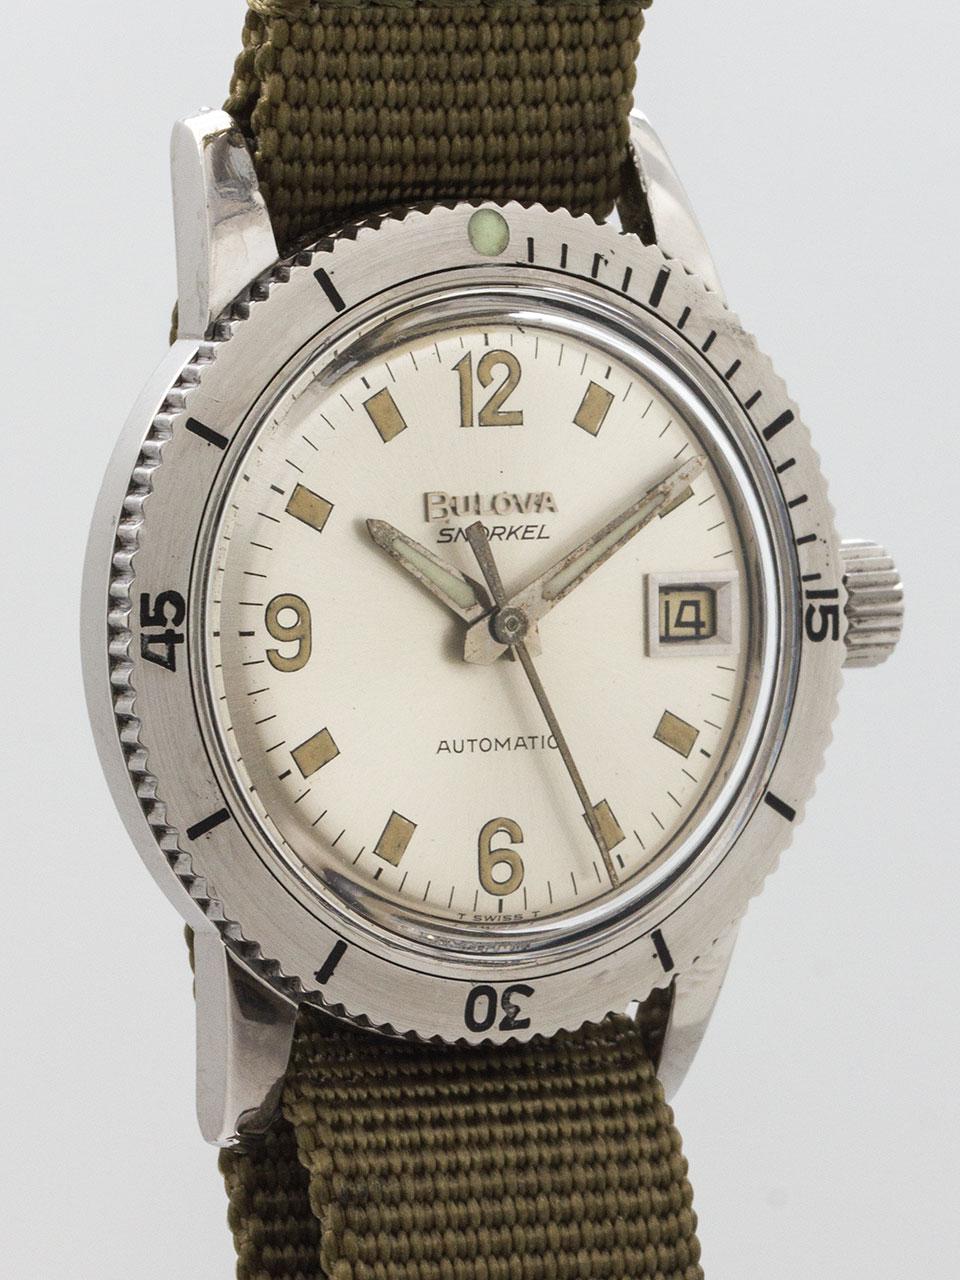 Bulova Divers Automatic 666 Feet circa 1960's